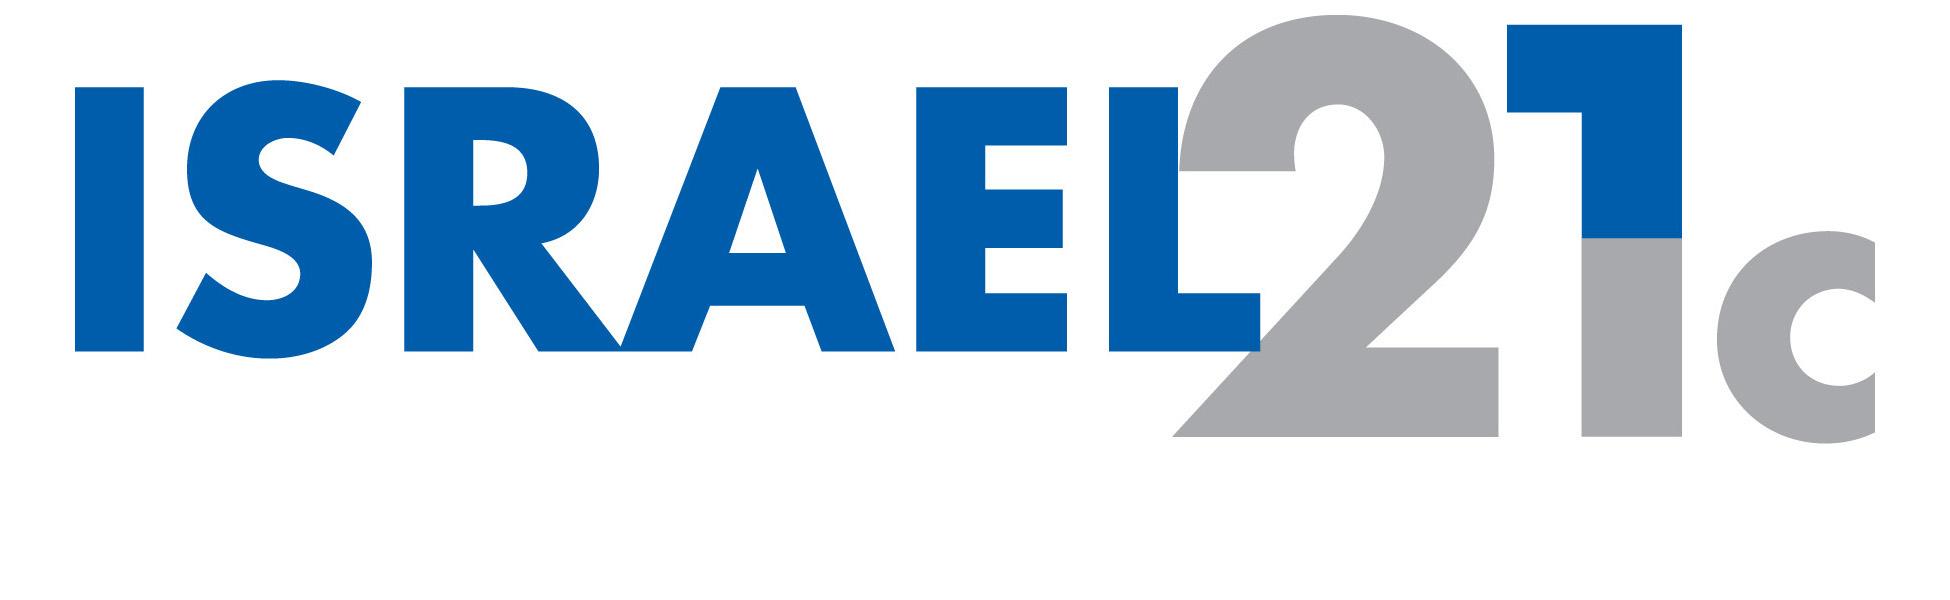 Israel21cLogoRGBCLEAN.jpg